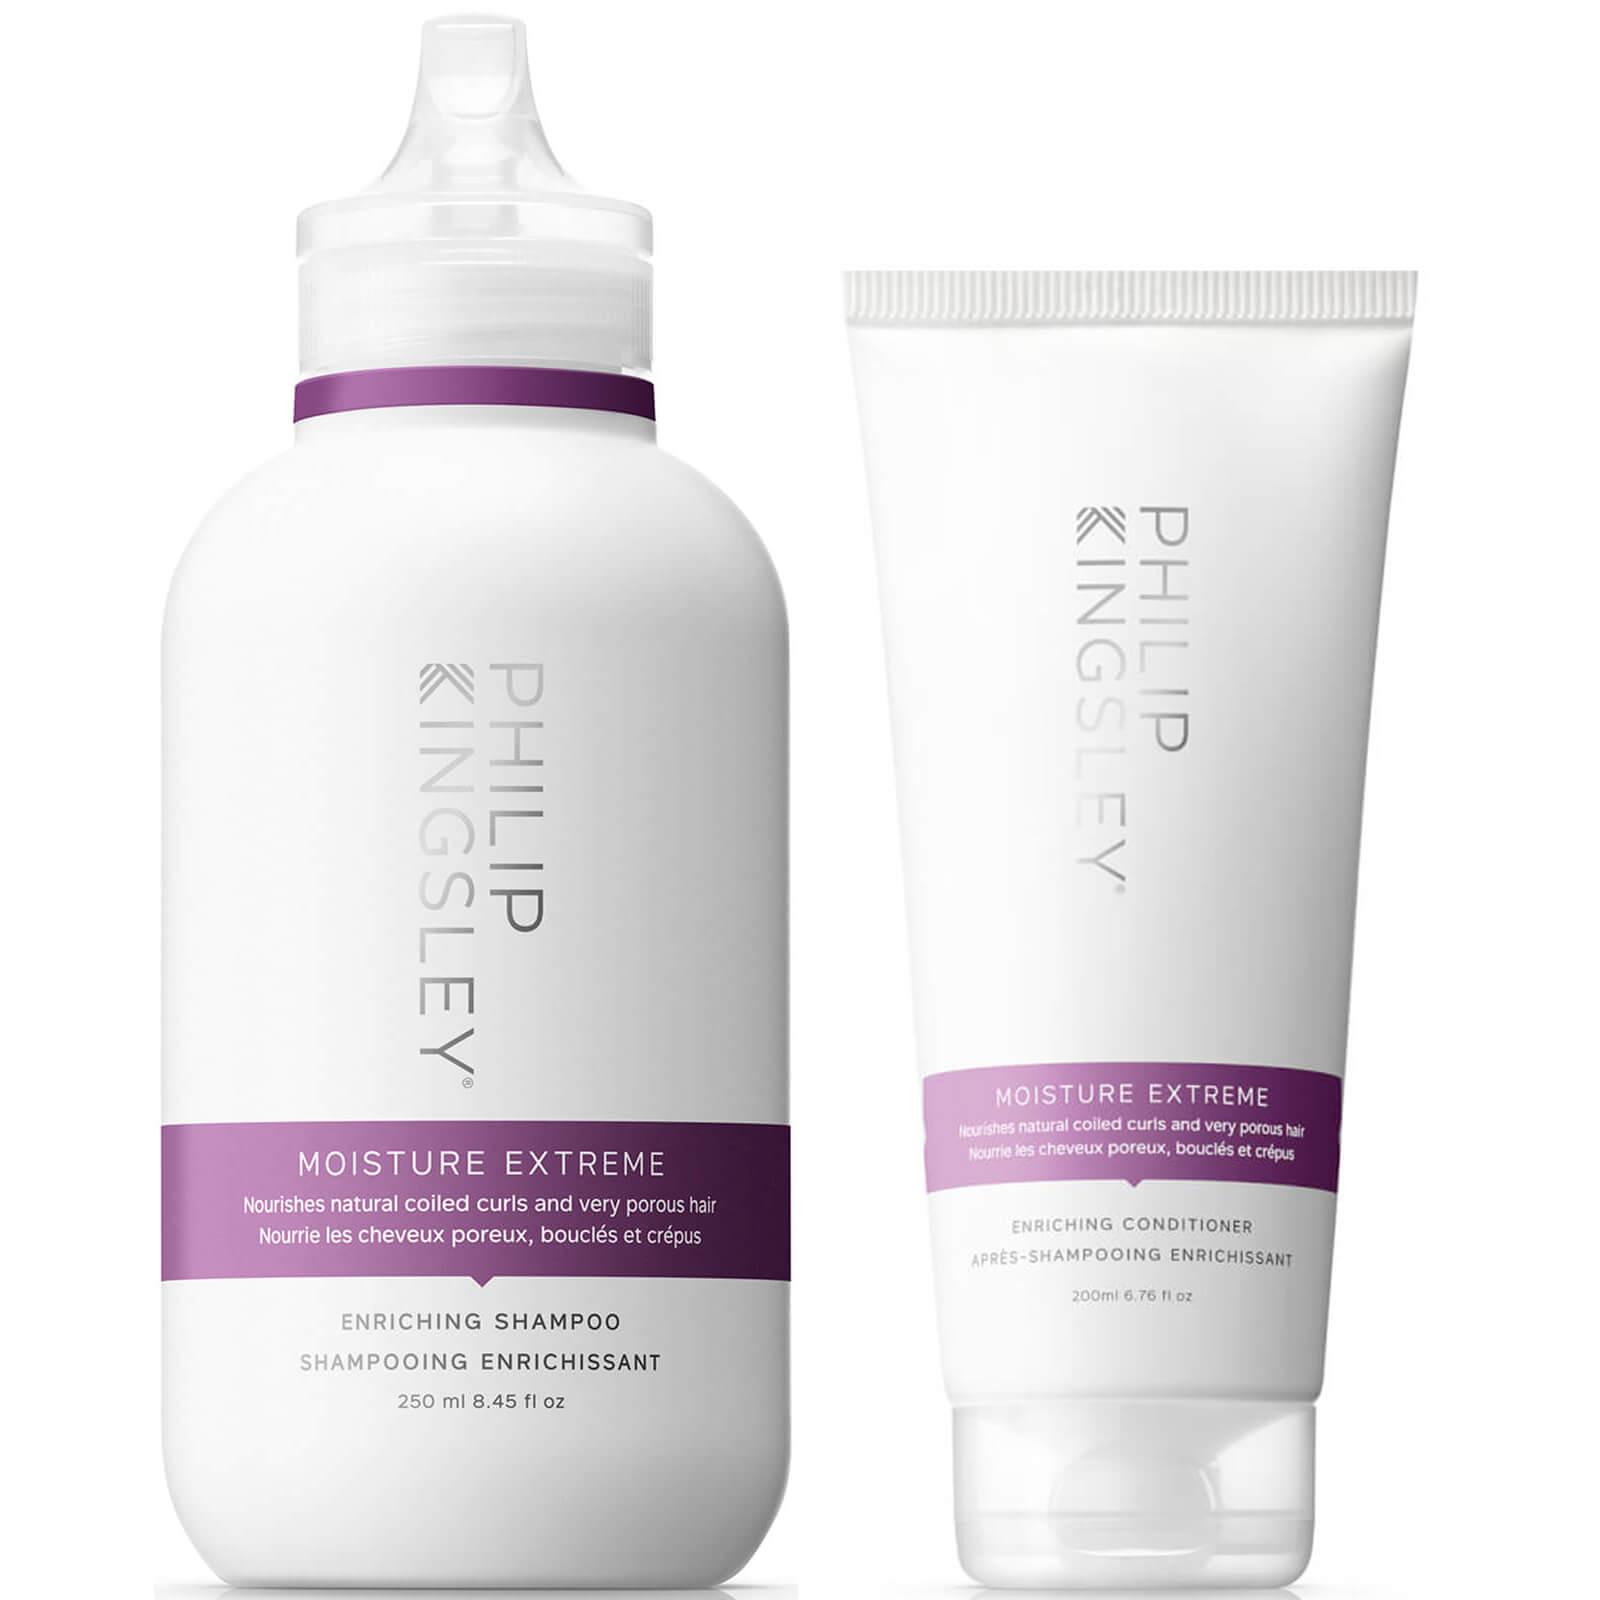 Купить Philip Kingsley Moisture Extreme Duo - Shampoo & Conditioner